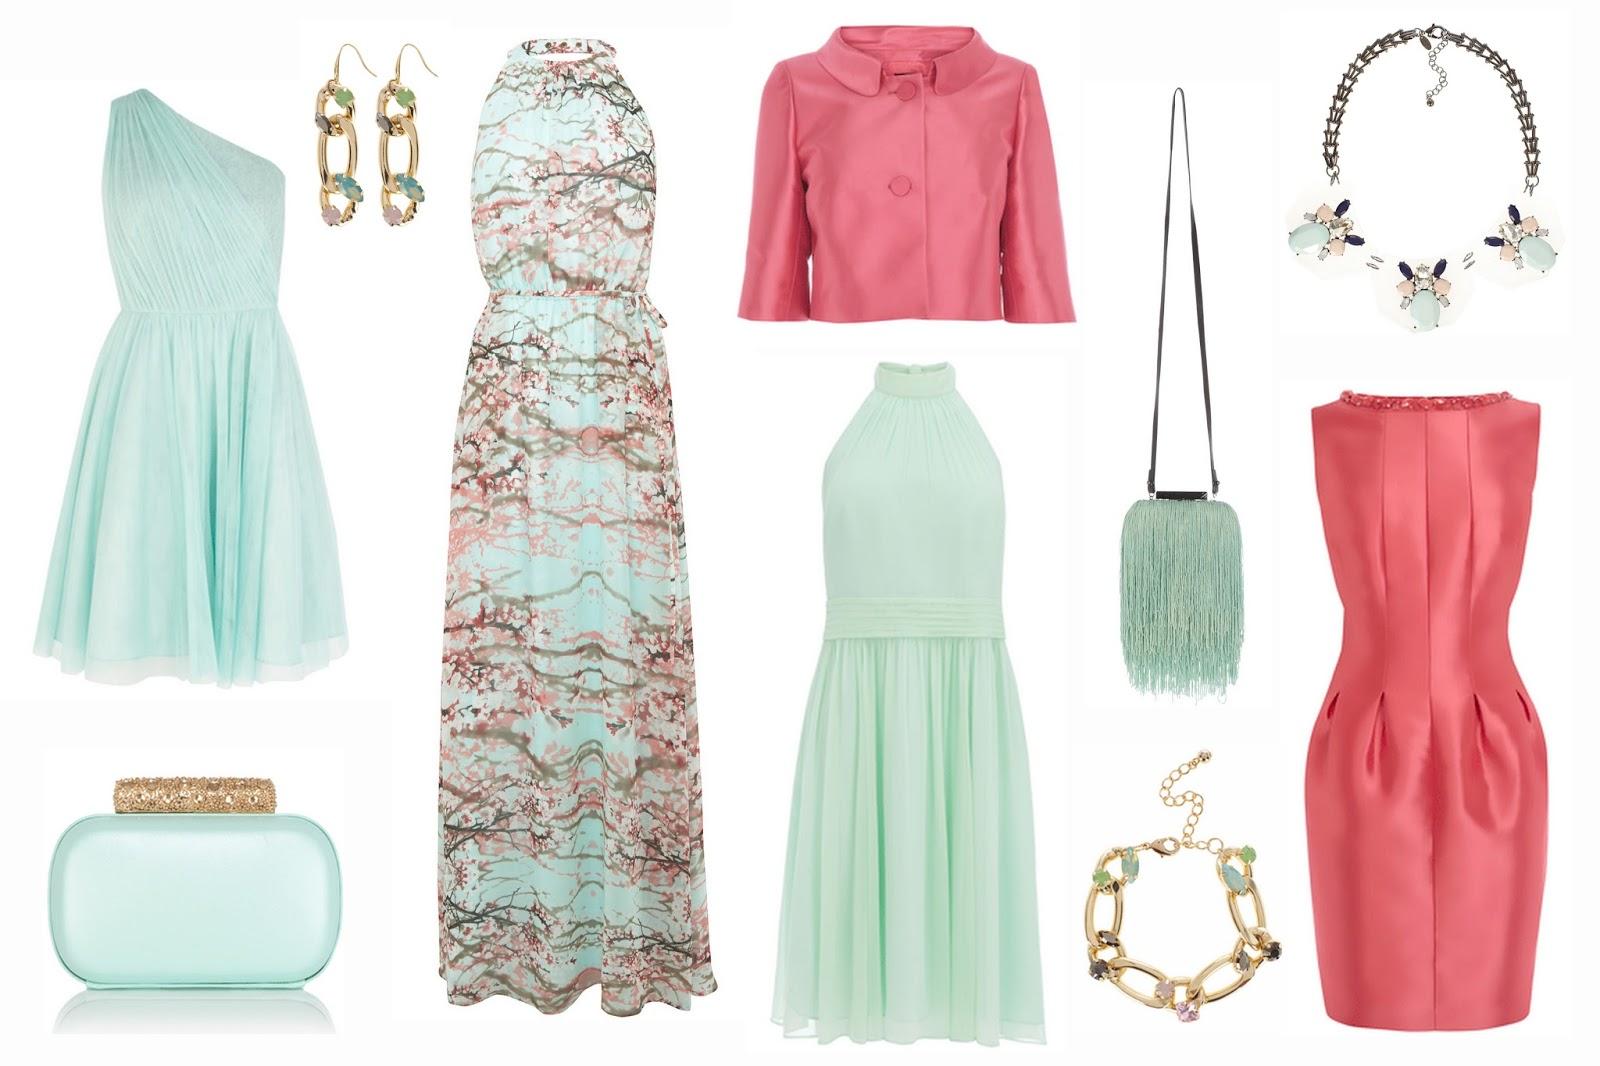 f3399193b5e From top to bottom  Poppy aqua mint one-shouldered dress £85. Naomi mint  clutch £28. Thalia earrings £5. Cherry Blossom maxi dress £115.